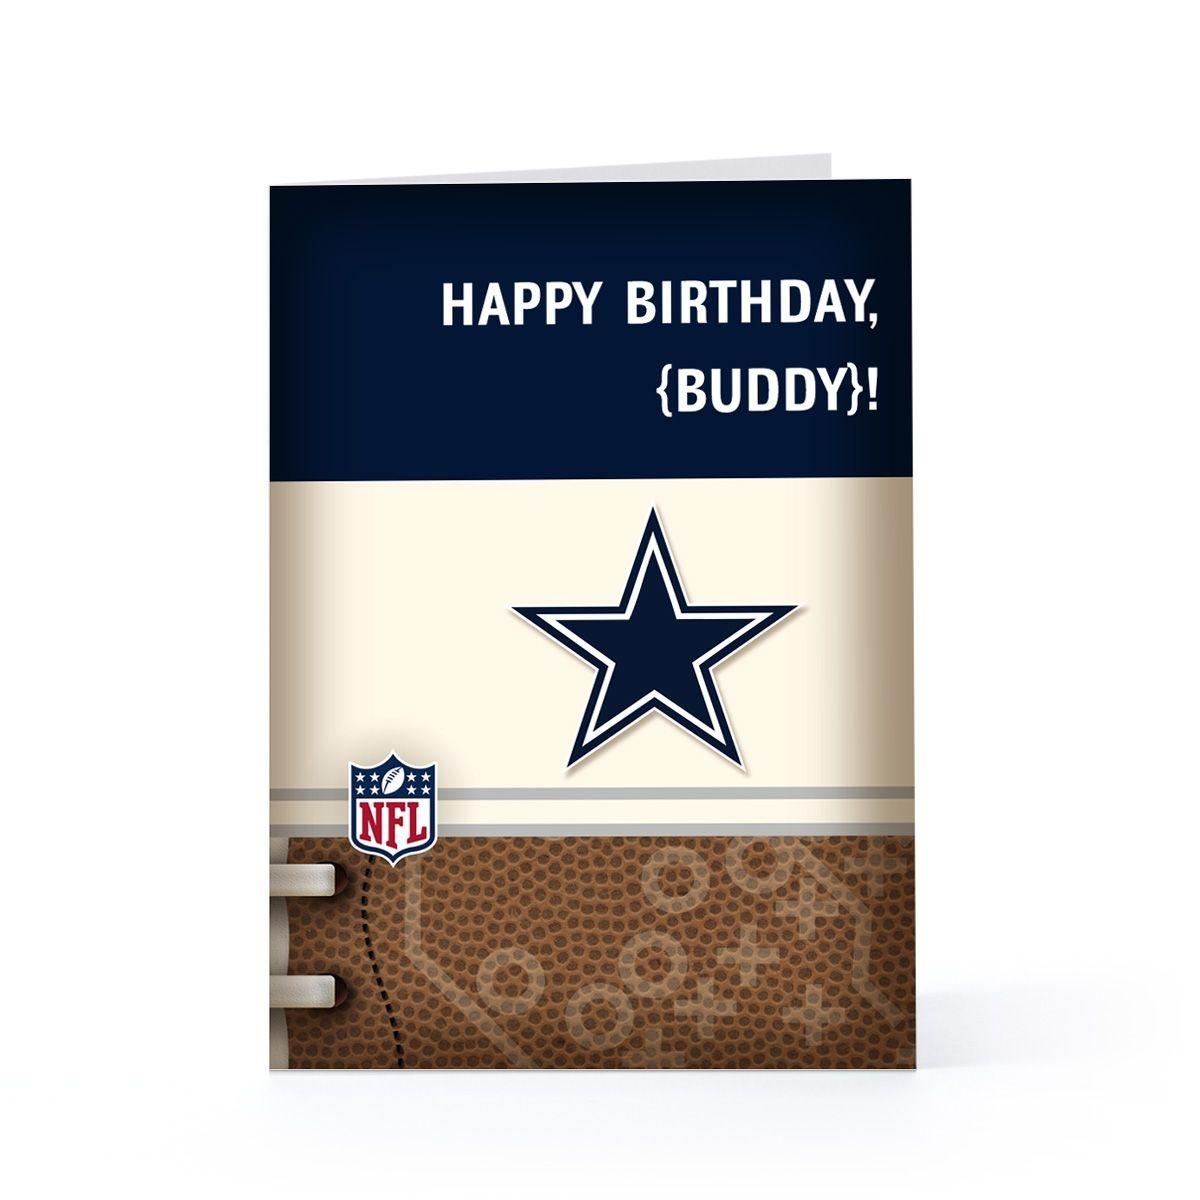 Dallas Cowboys Birthday Cards | Other Hallmark Sites | Birthday - Free Printable Cowboy Birthday Cards